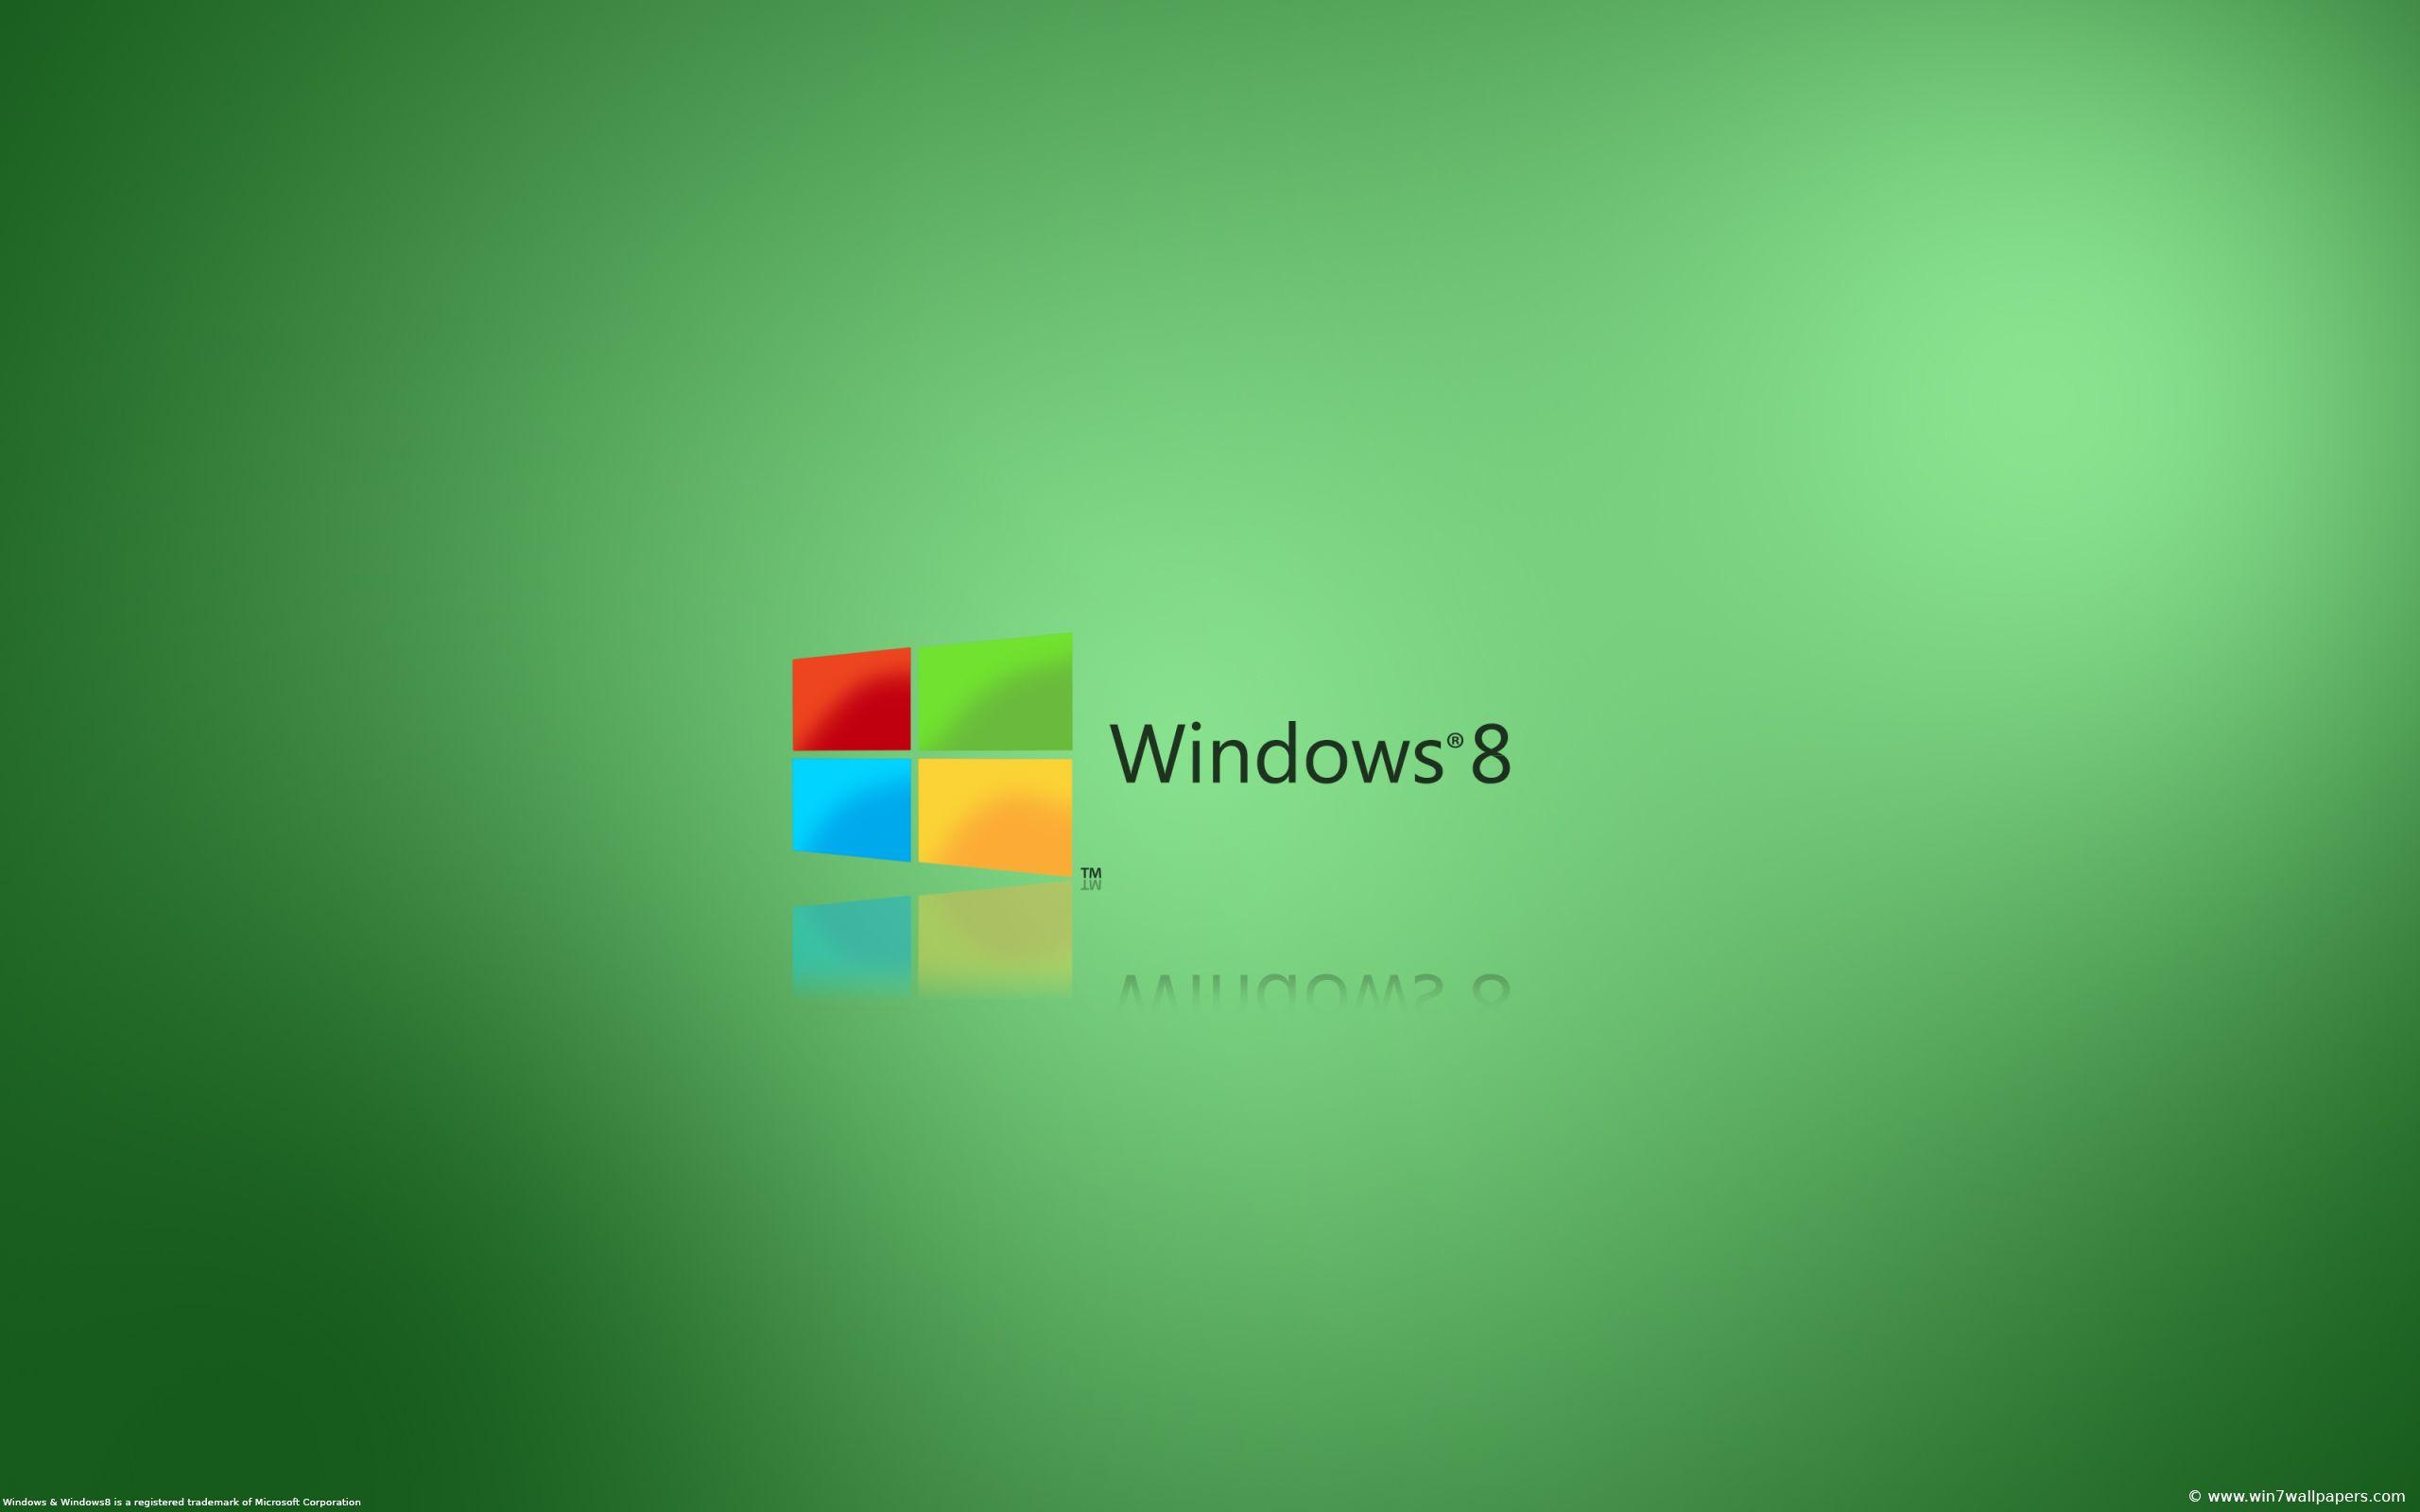 Simple Windows 8 Desktop Background Hdpicorner Windows 8 green brand logo wallpapers hd